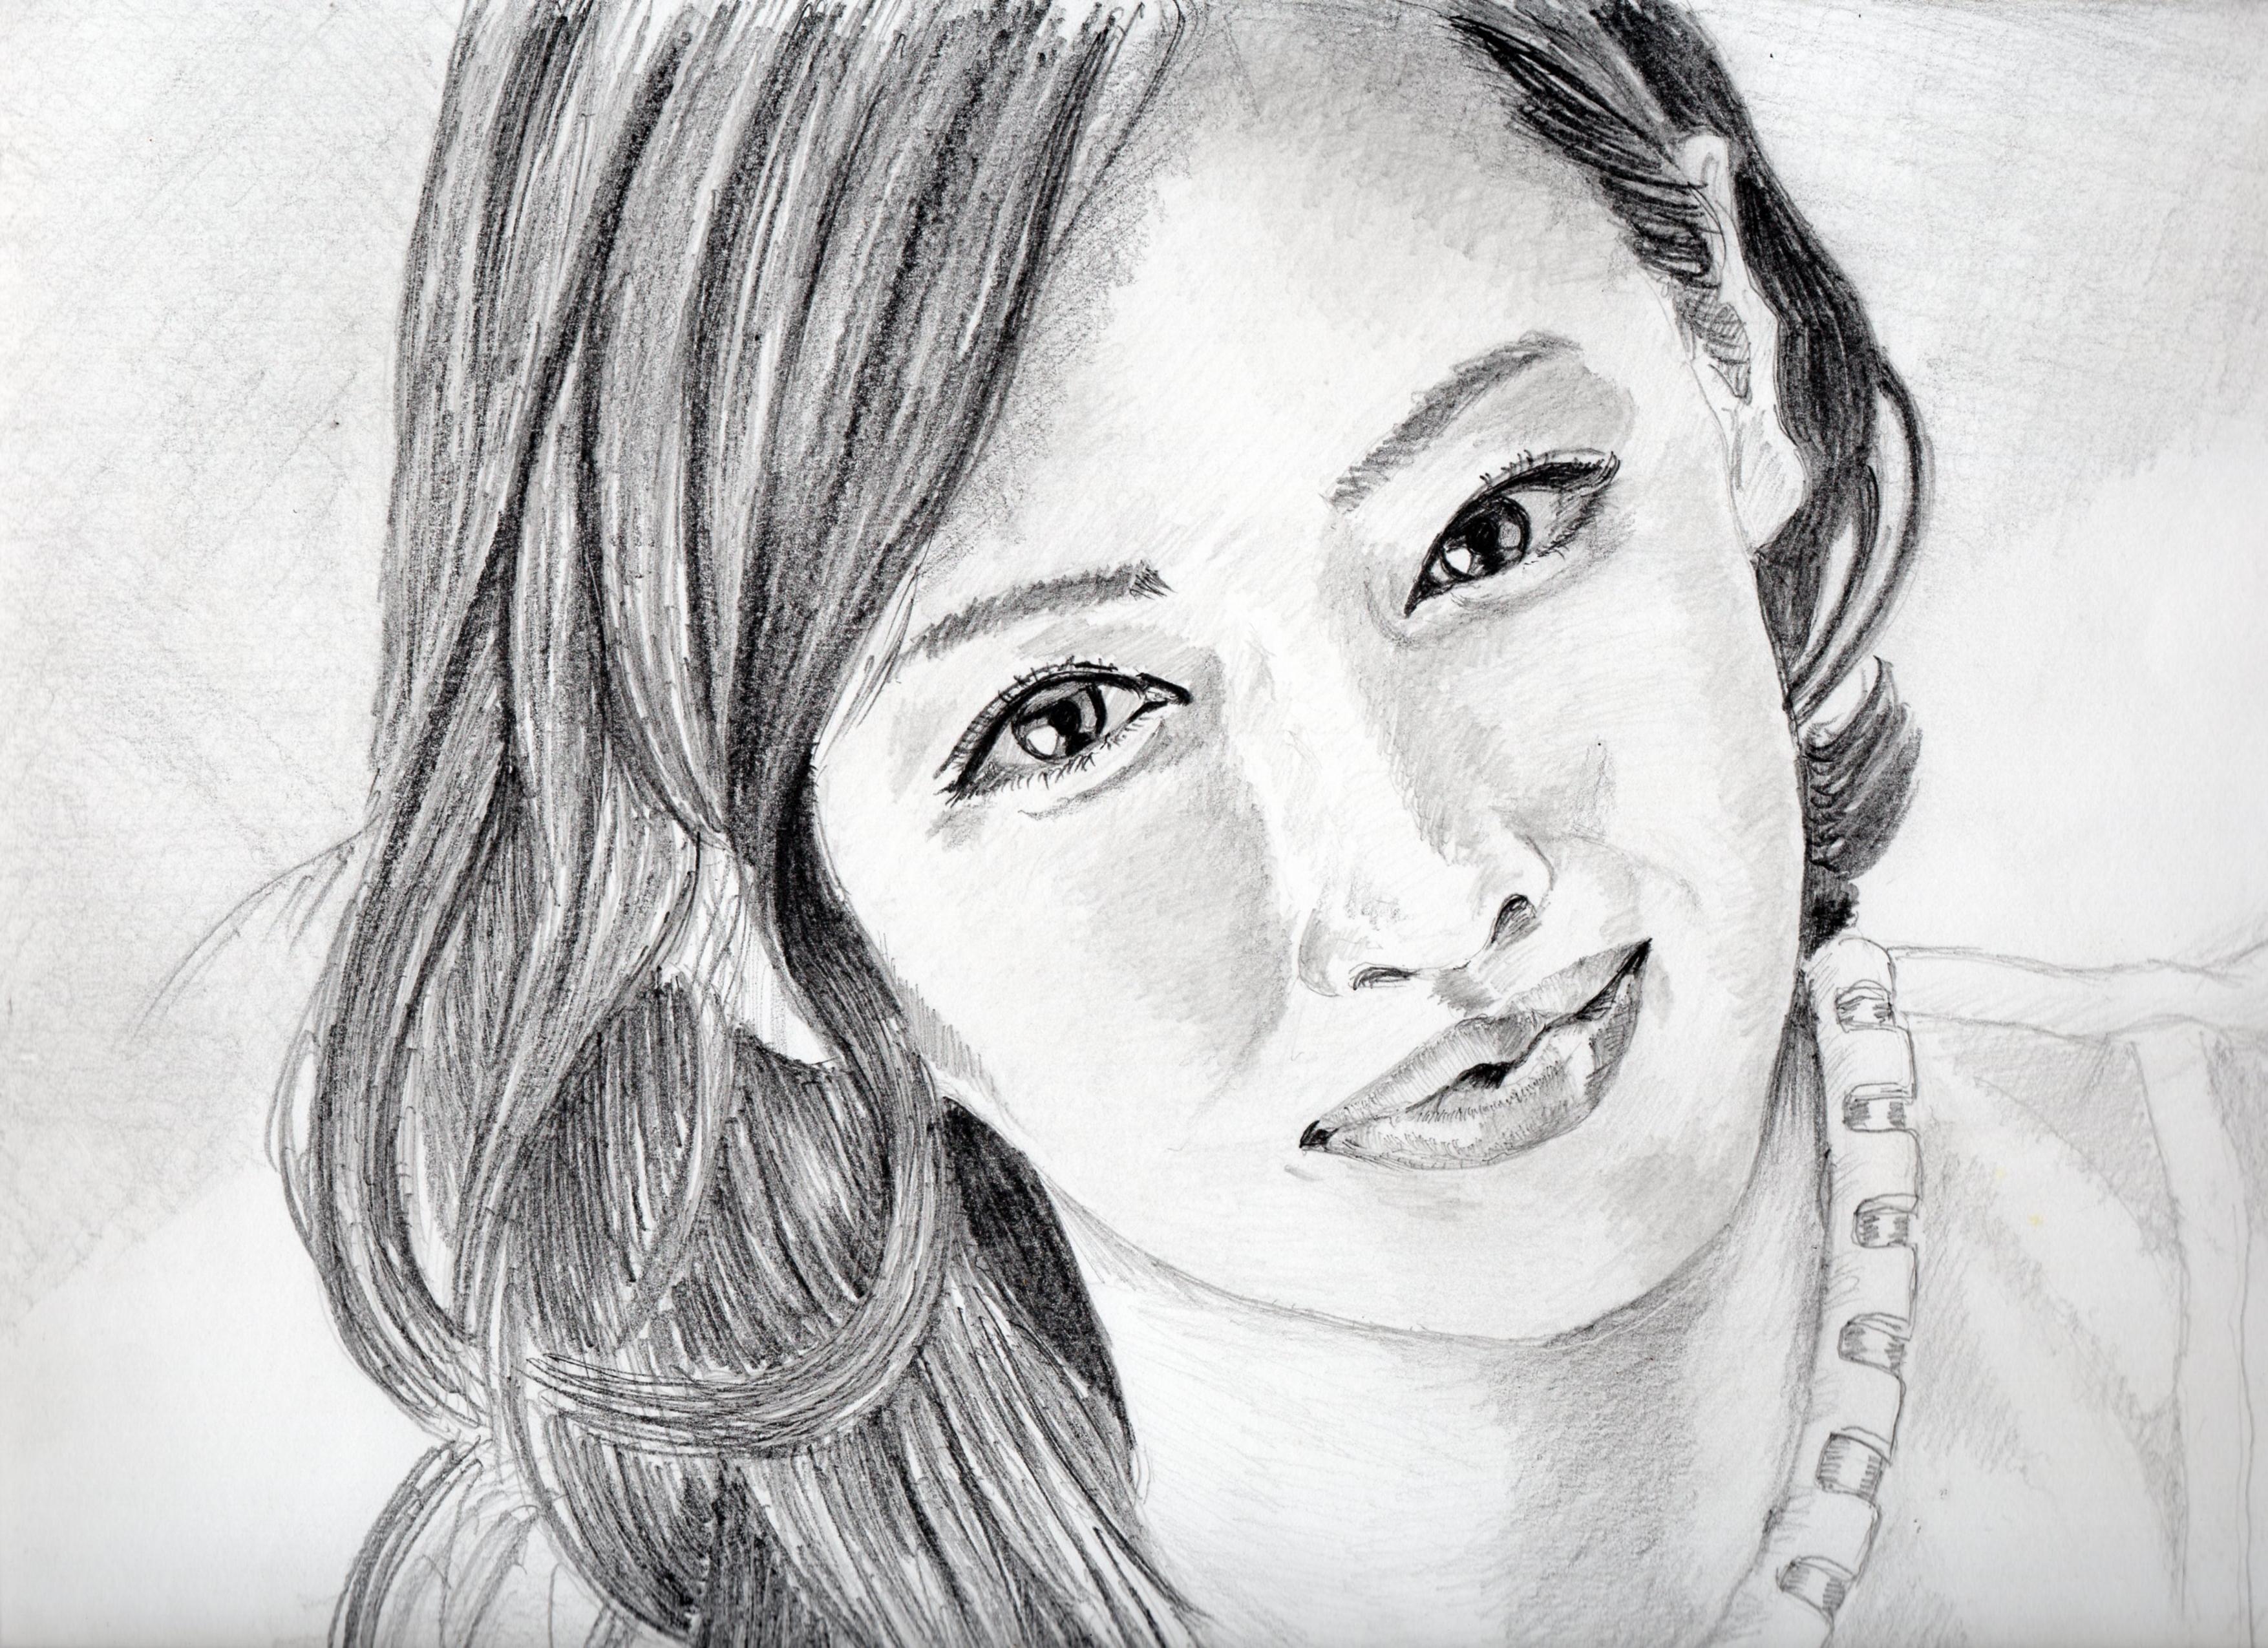 北川景子の鉛筆画似顔絵 北川景子のリアル鉛筆画似顔絵